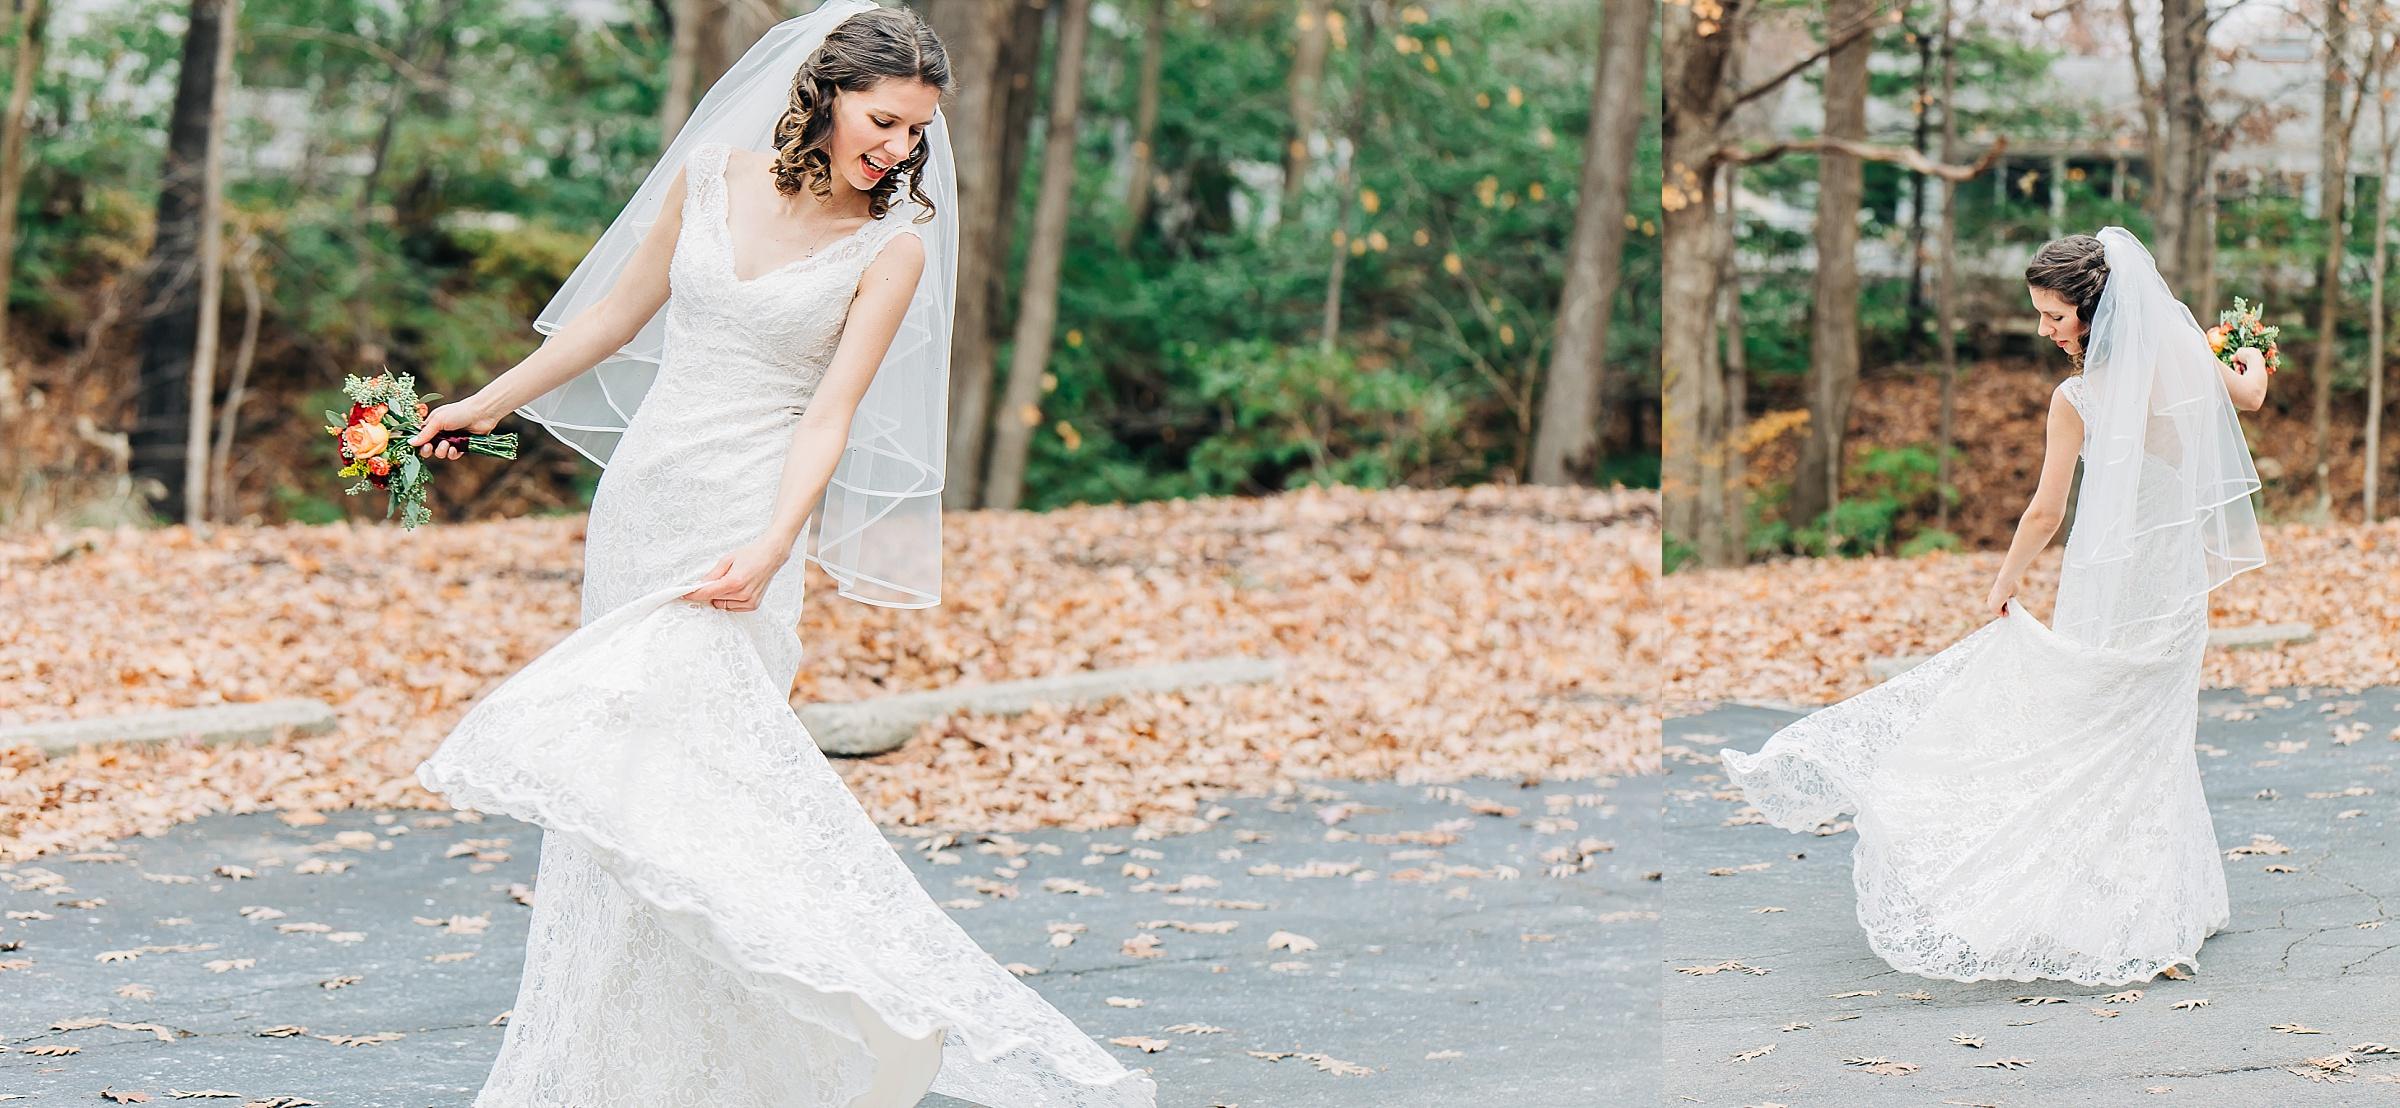 west lafayette indiana wedding photographer church duncan hall_0200.jpg